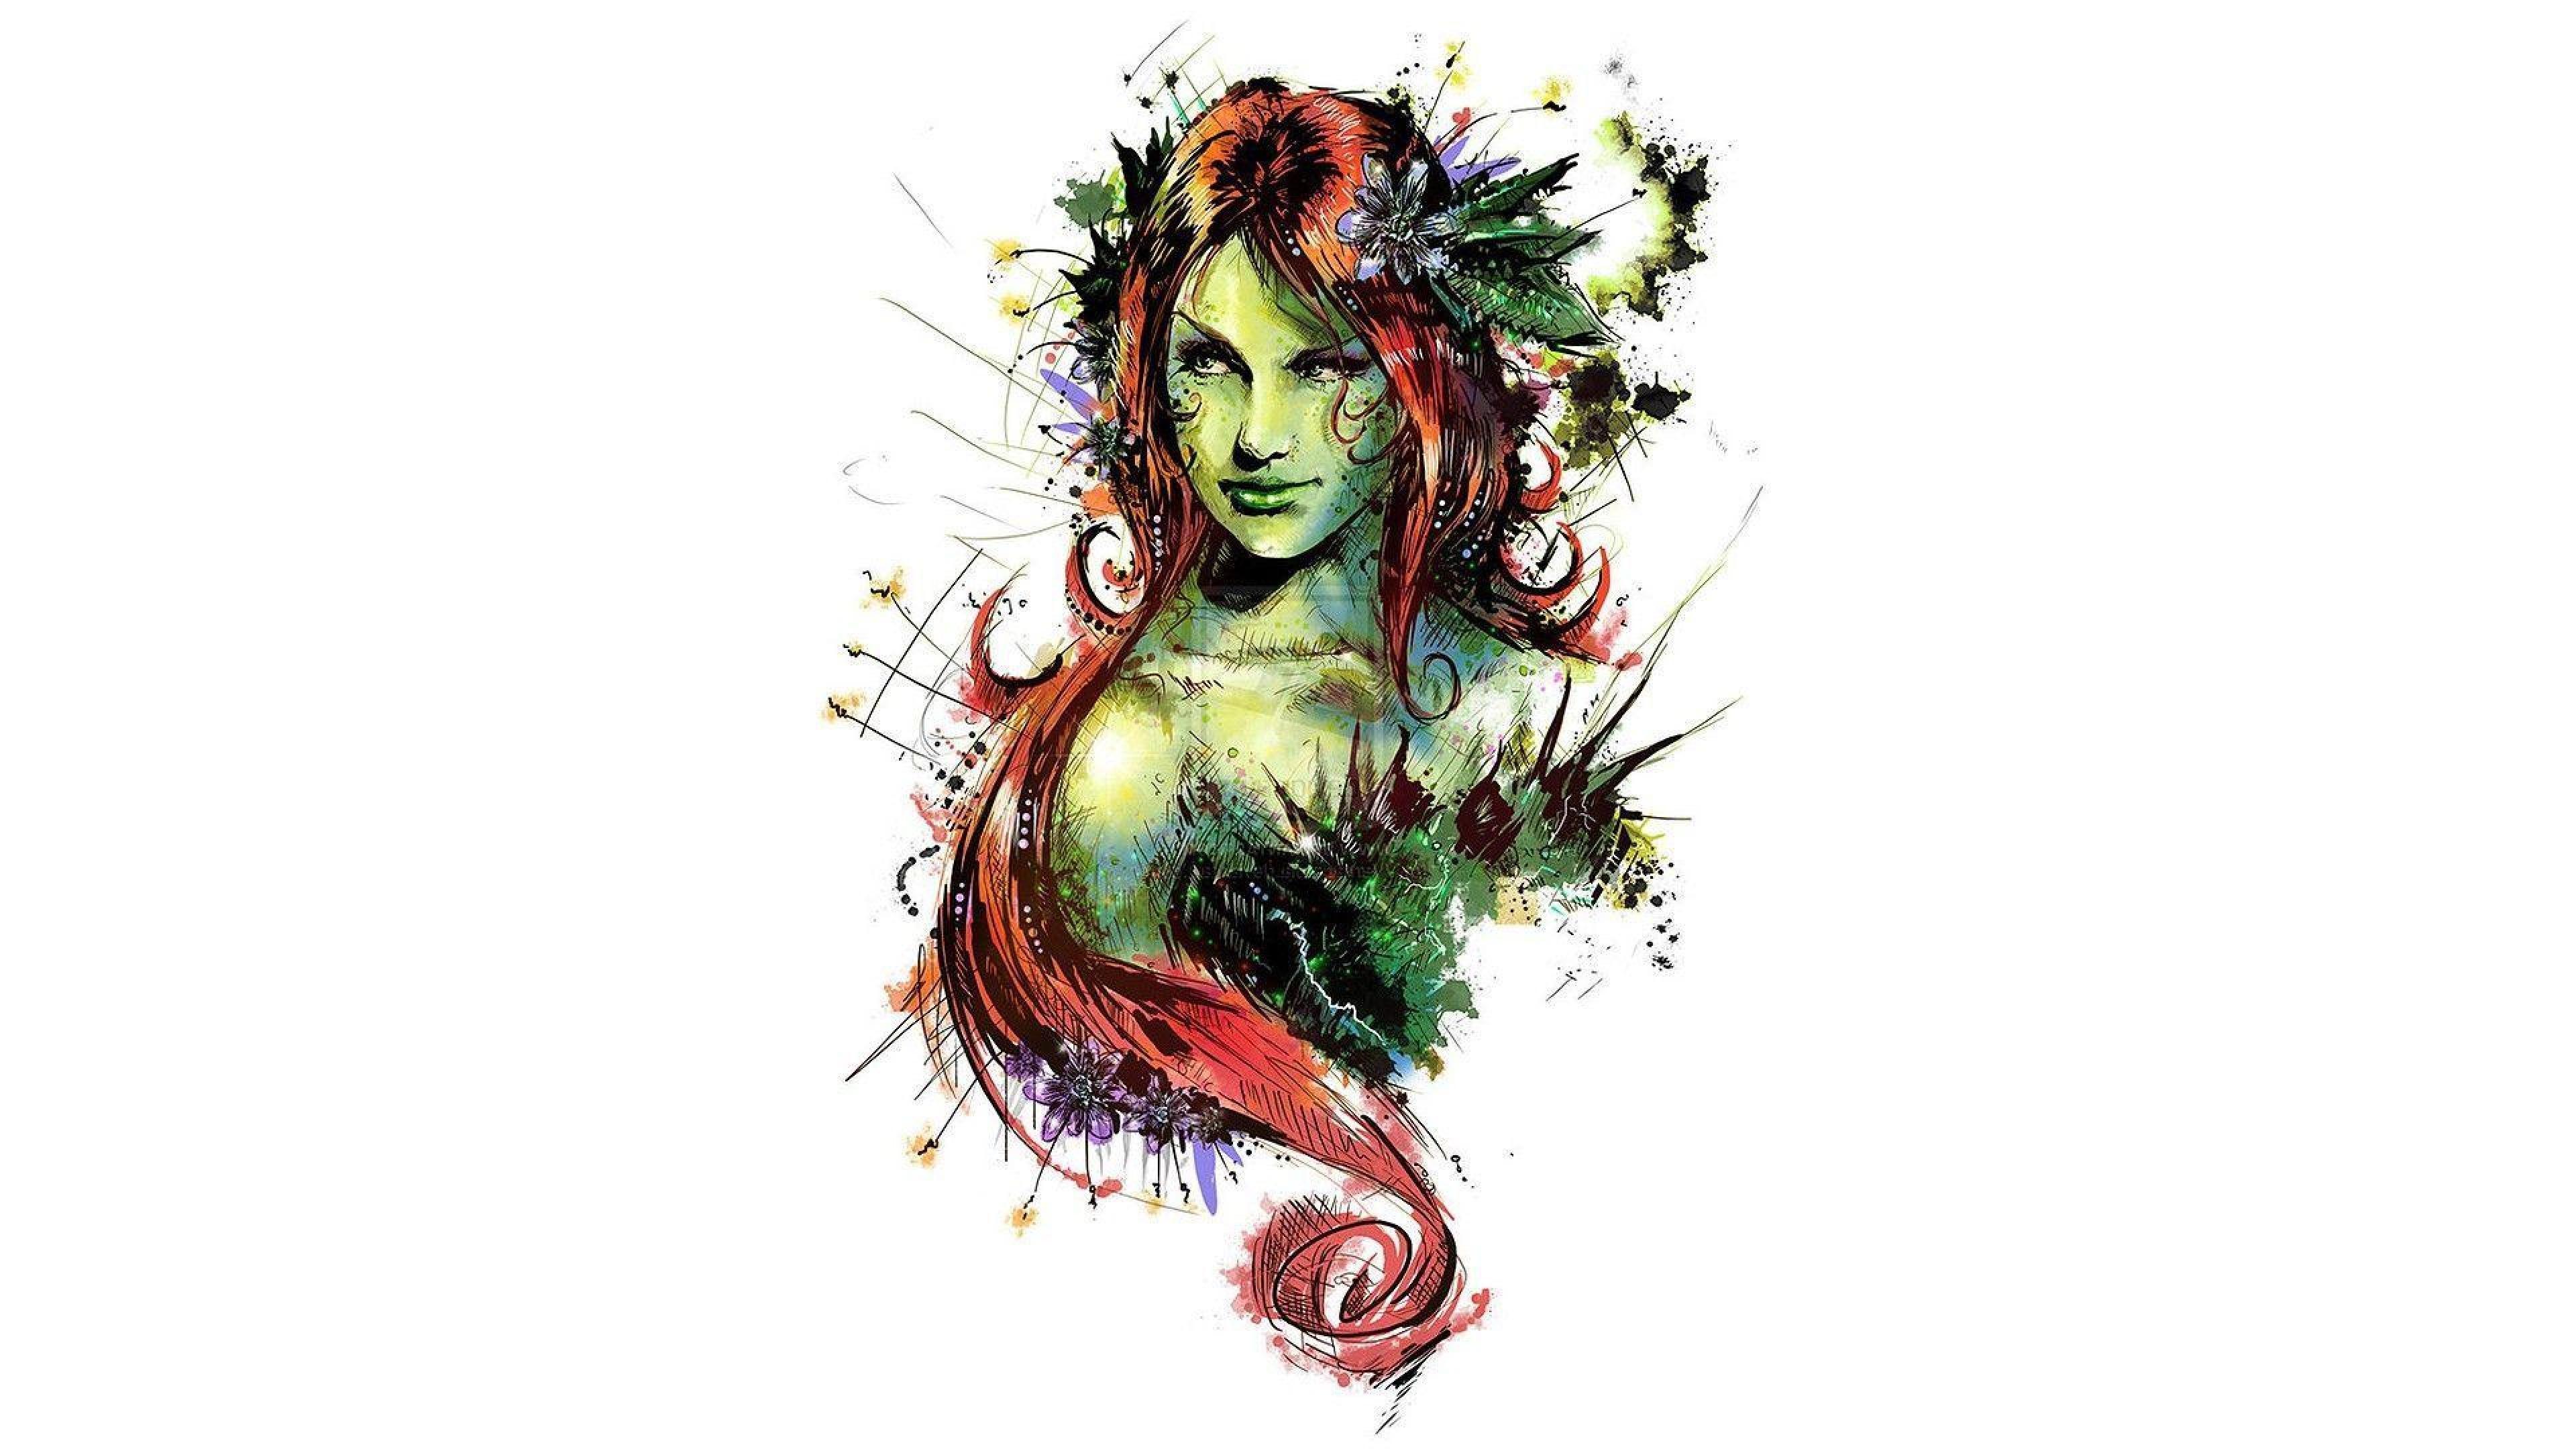 Dc Ivy Comics Poison Poison Ivy Hd Wallpapers Desktop Backgrounds